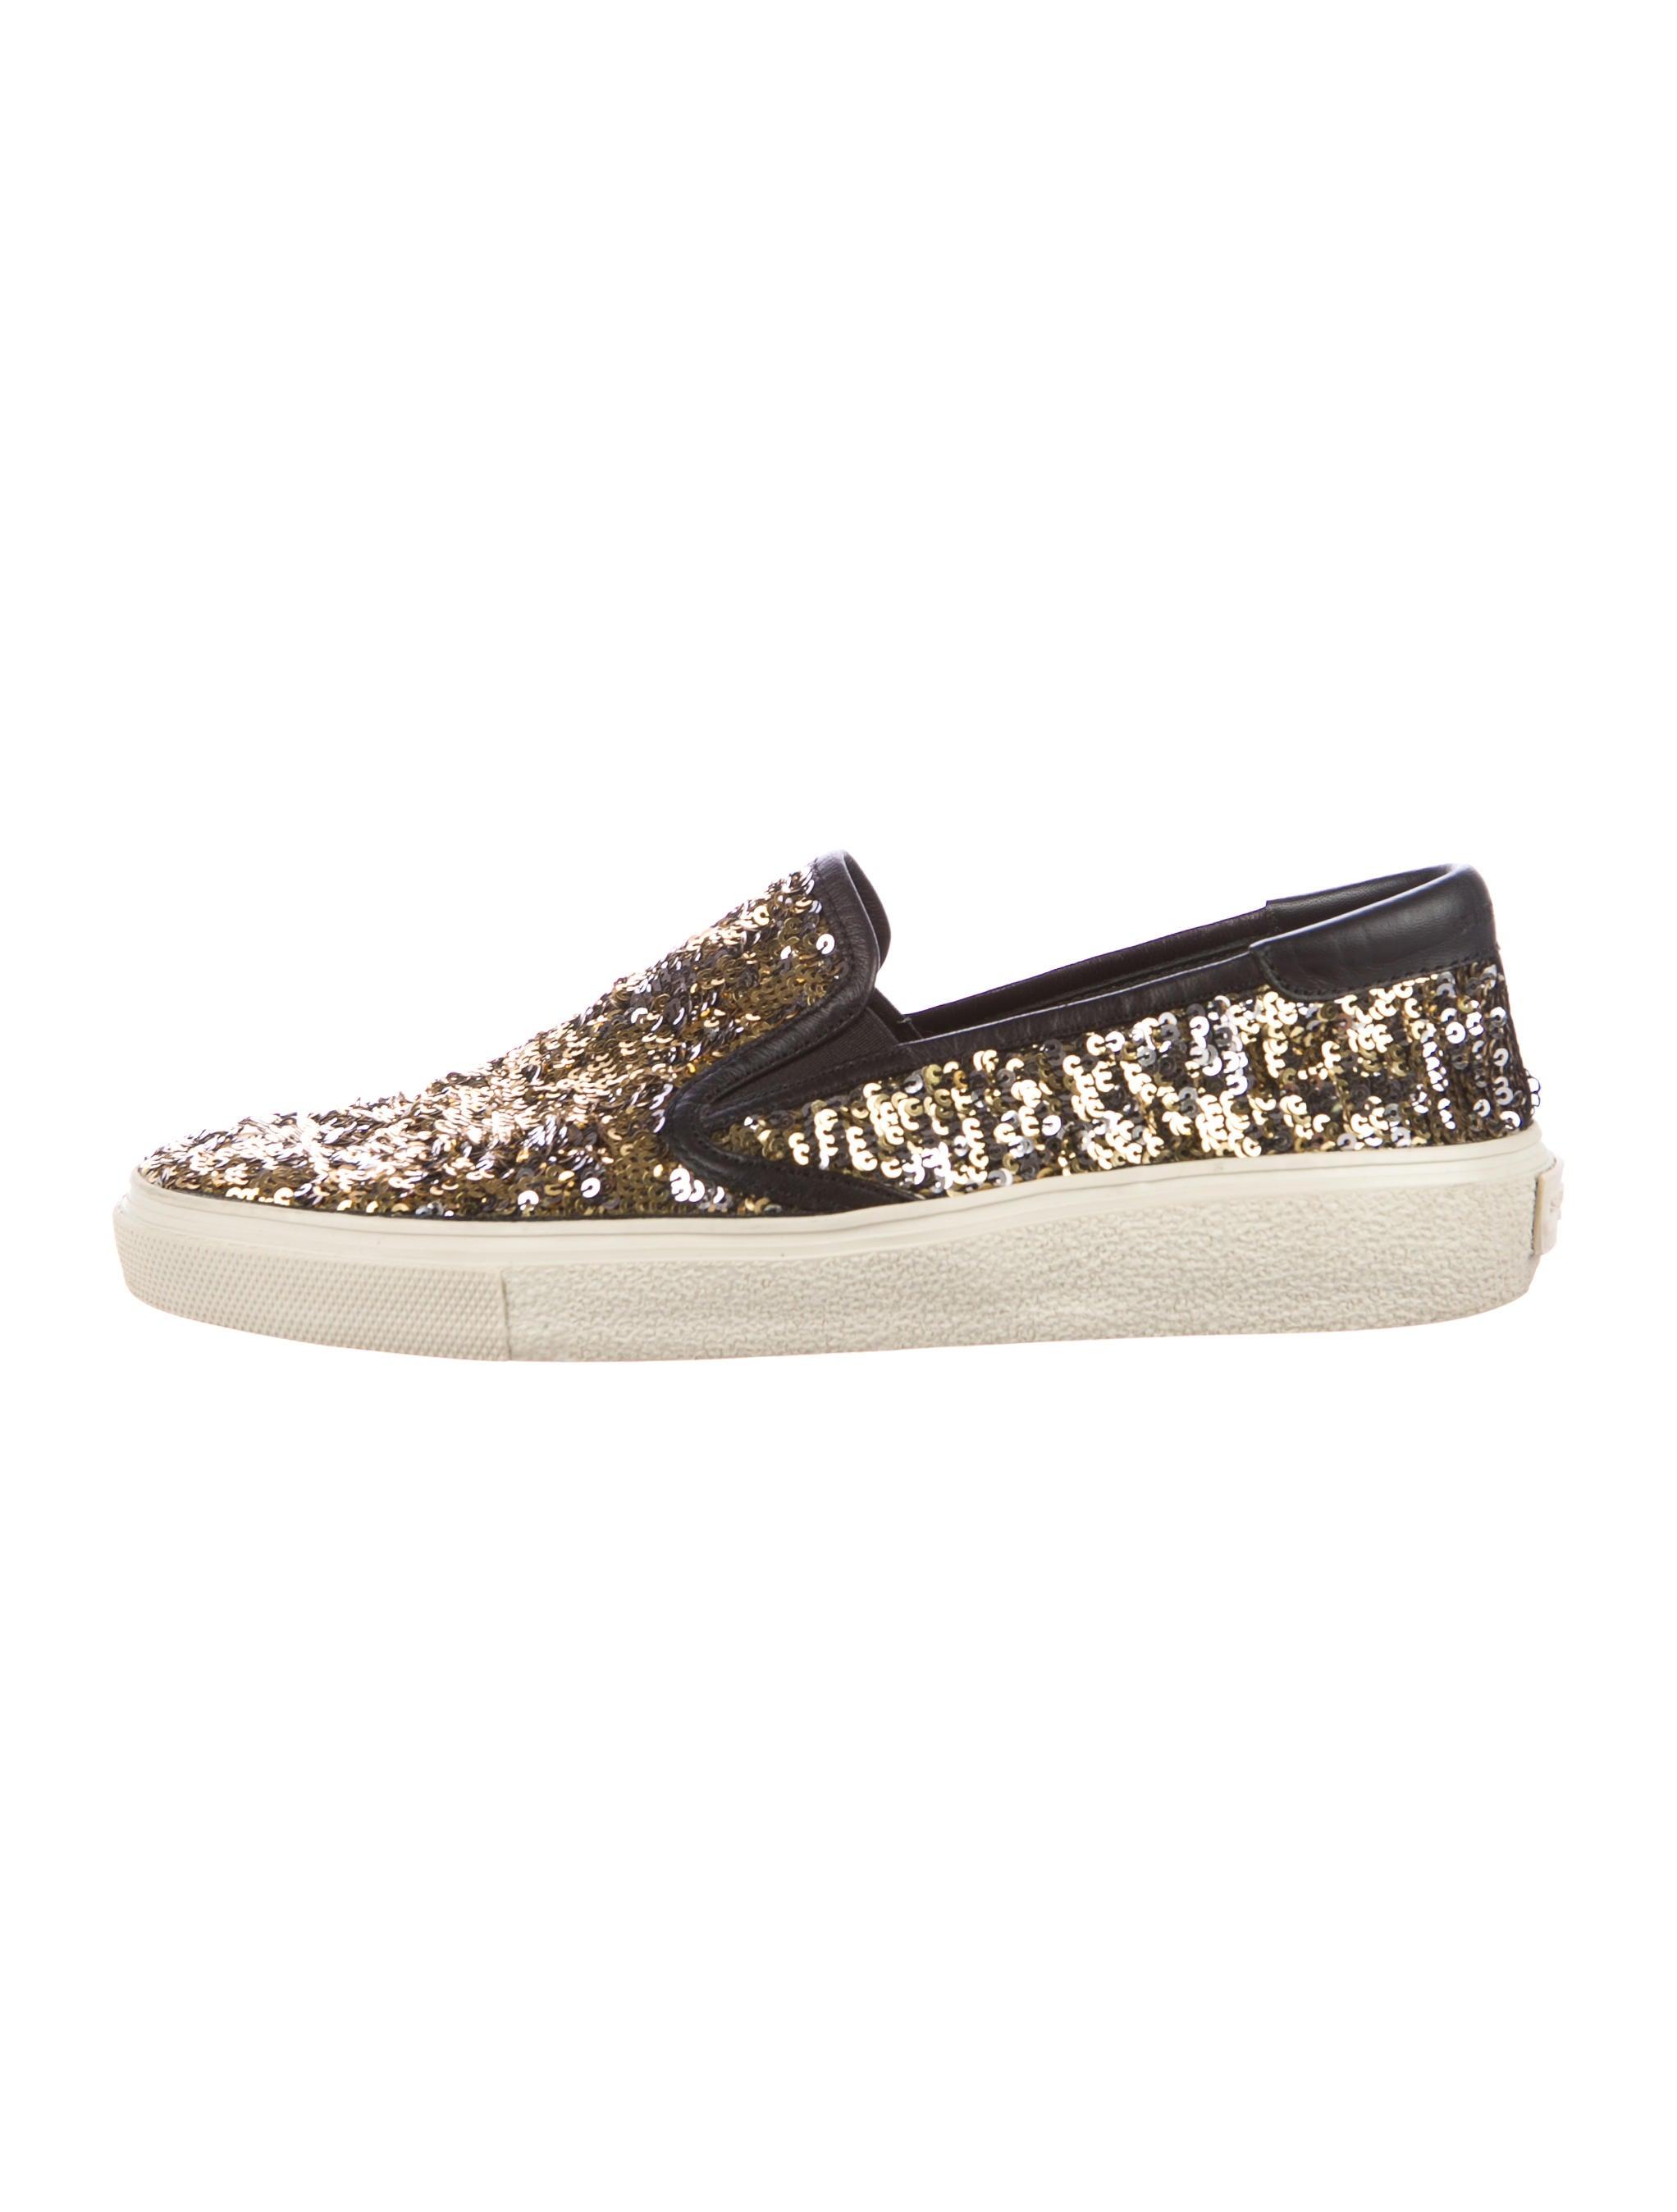 laurent sequin slip on sneakers shoes snt37138